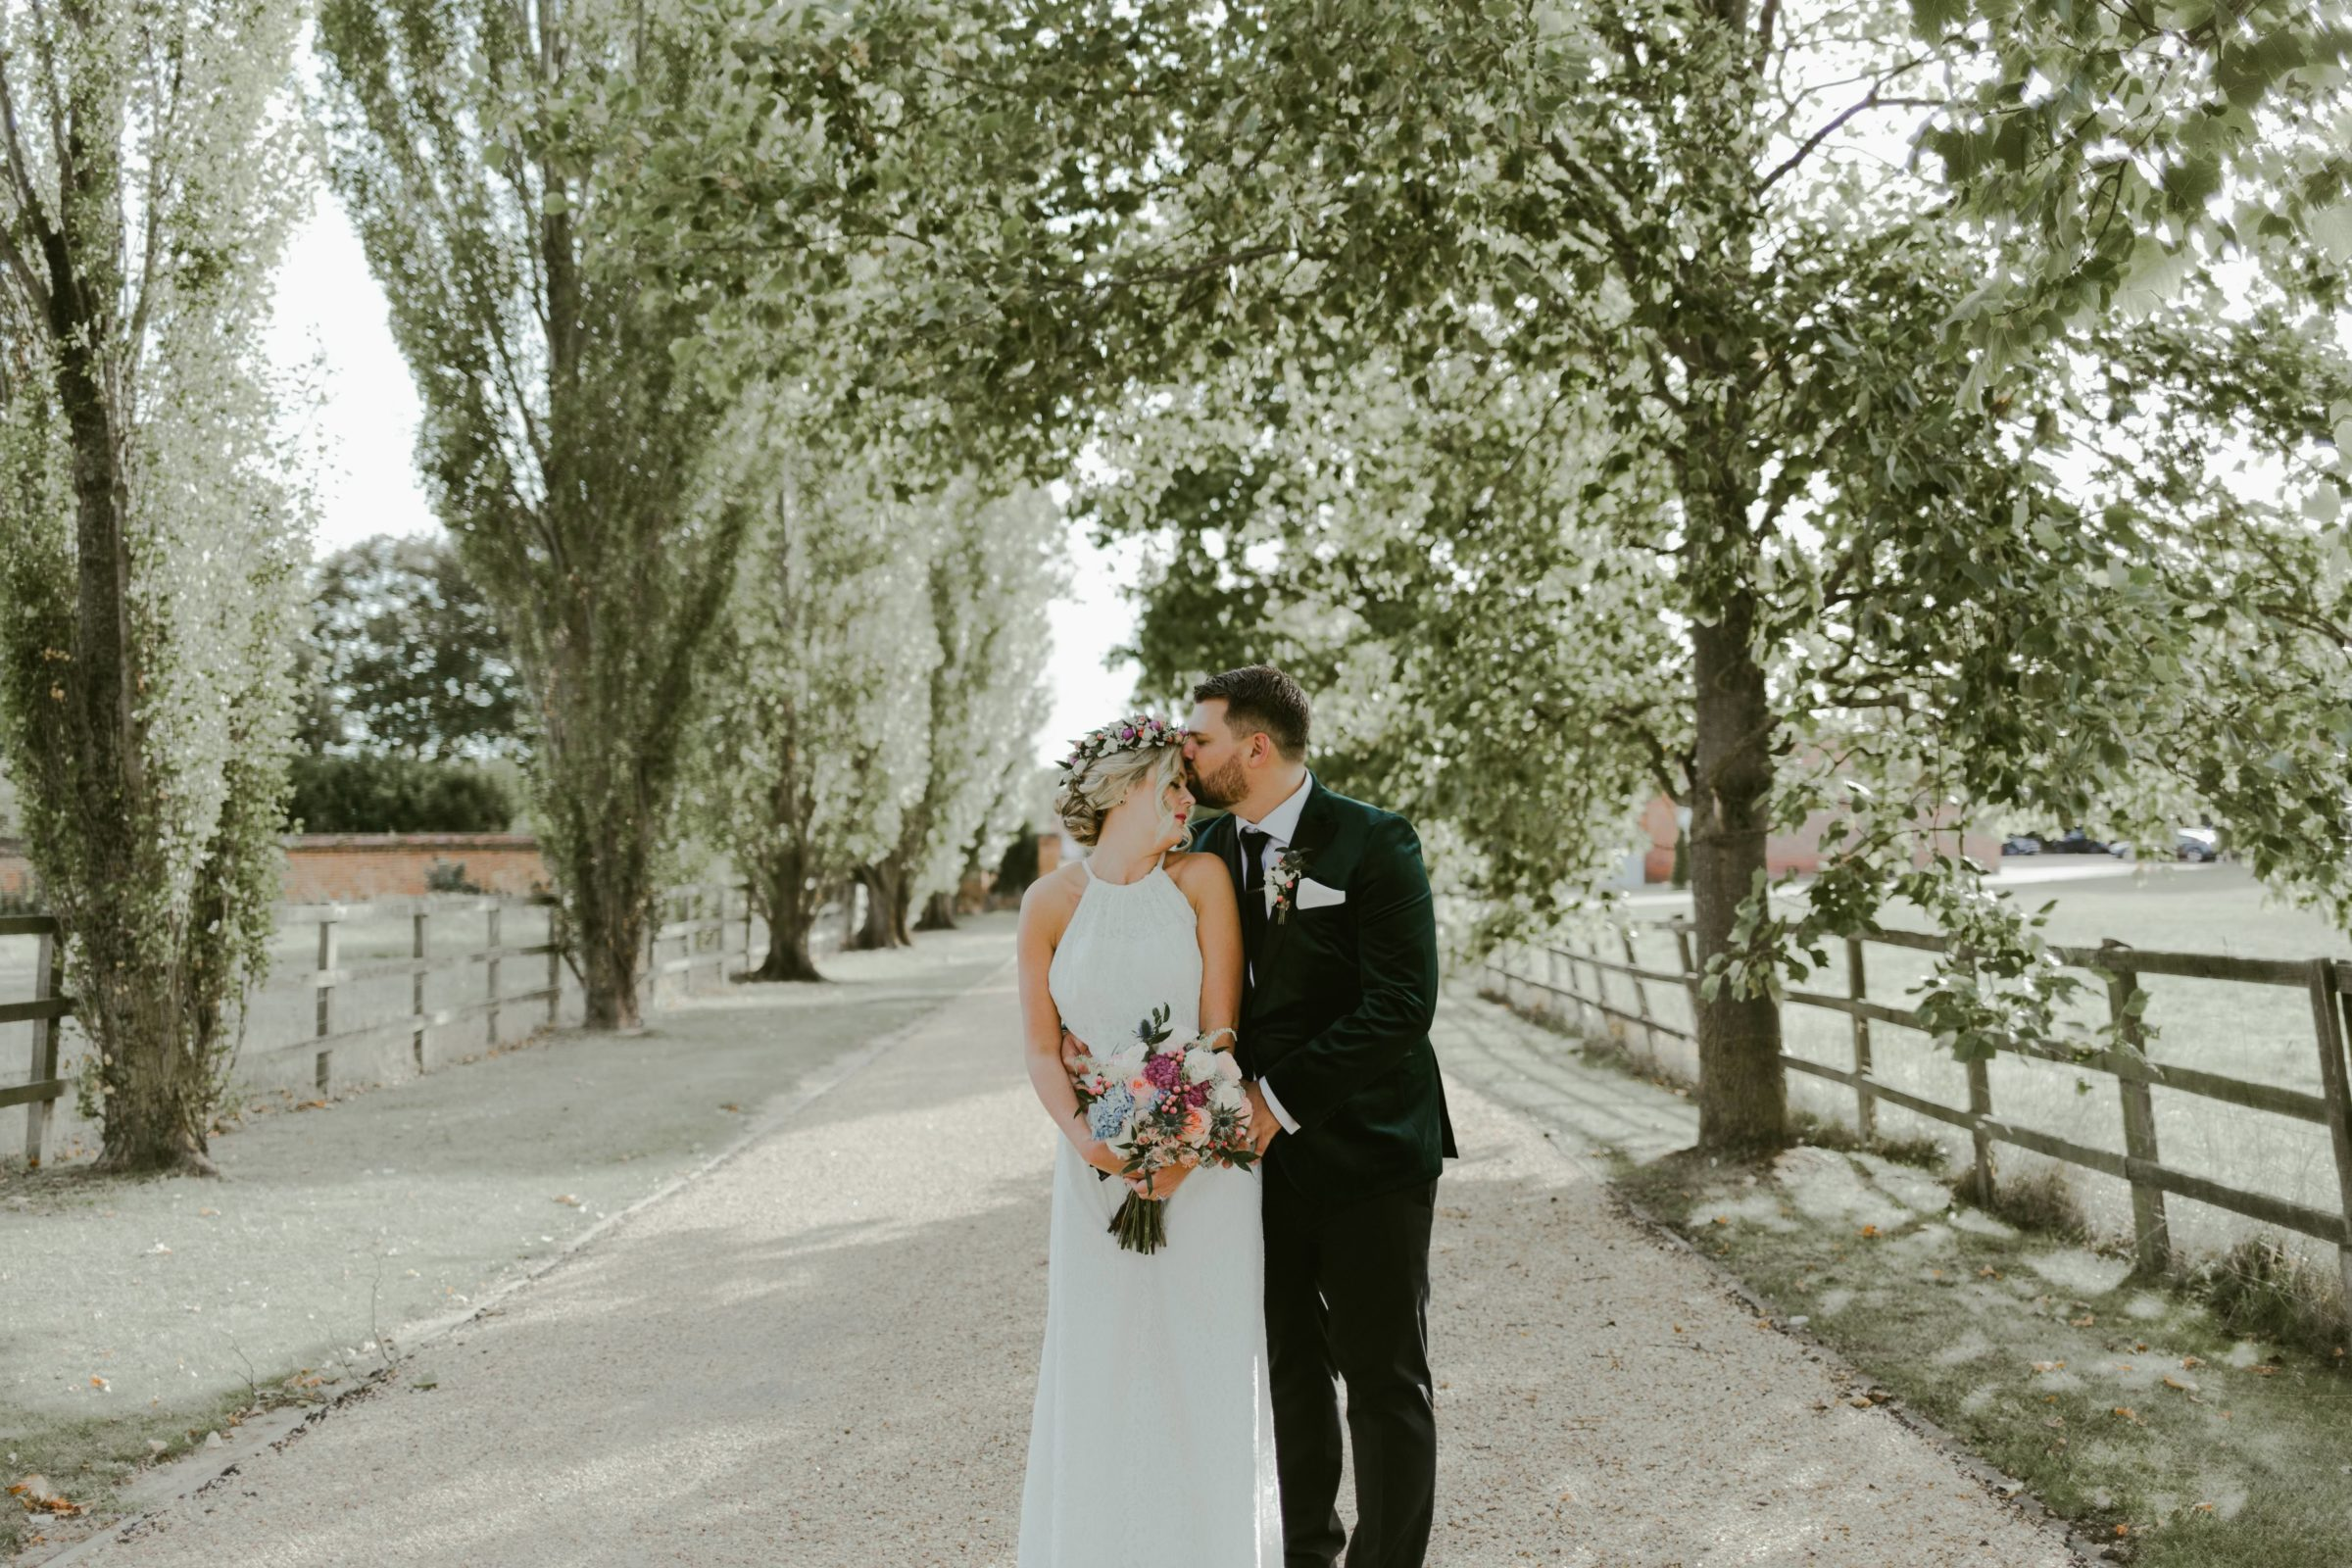 lillibrooke-manor-wedding-venue-photography-surrey-photographer